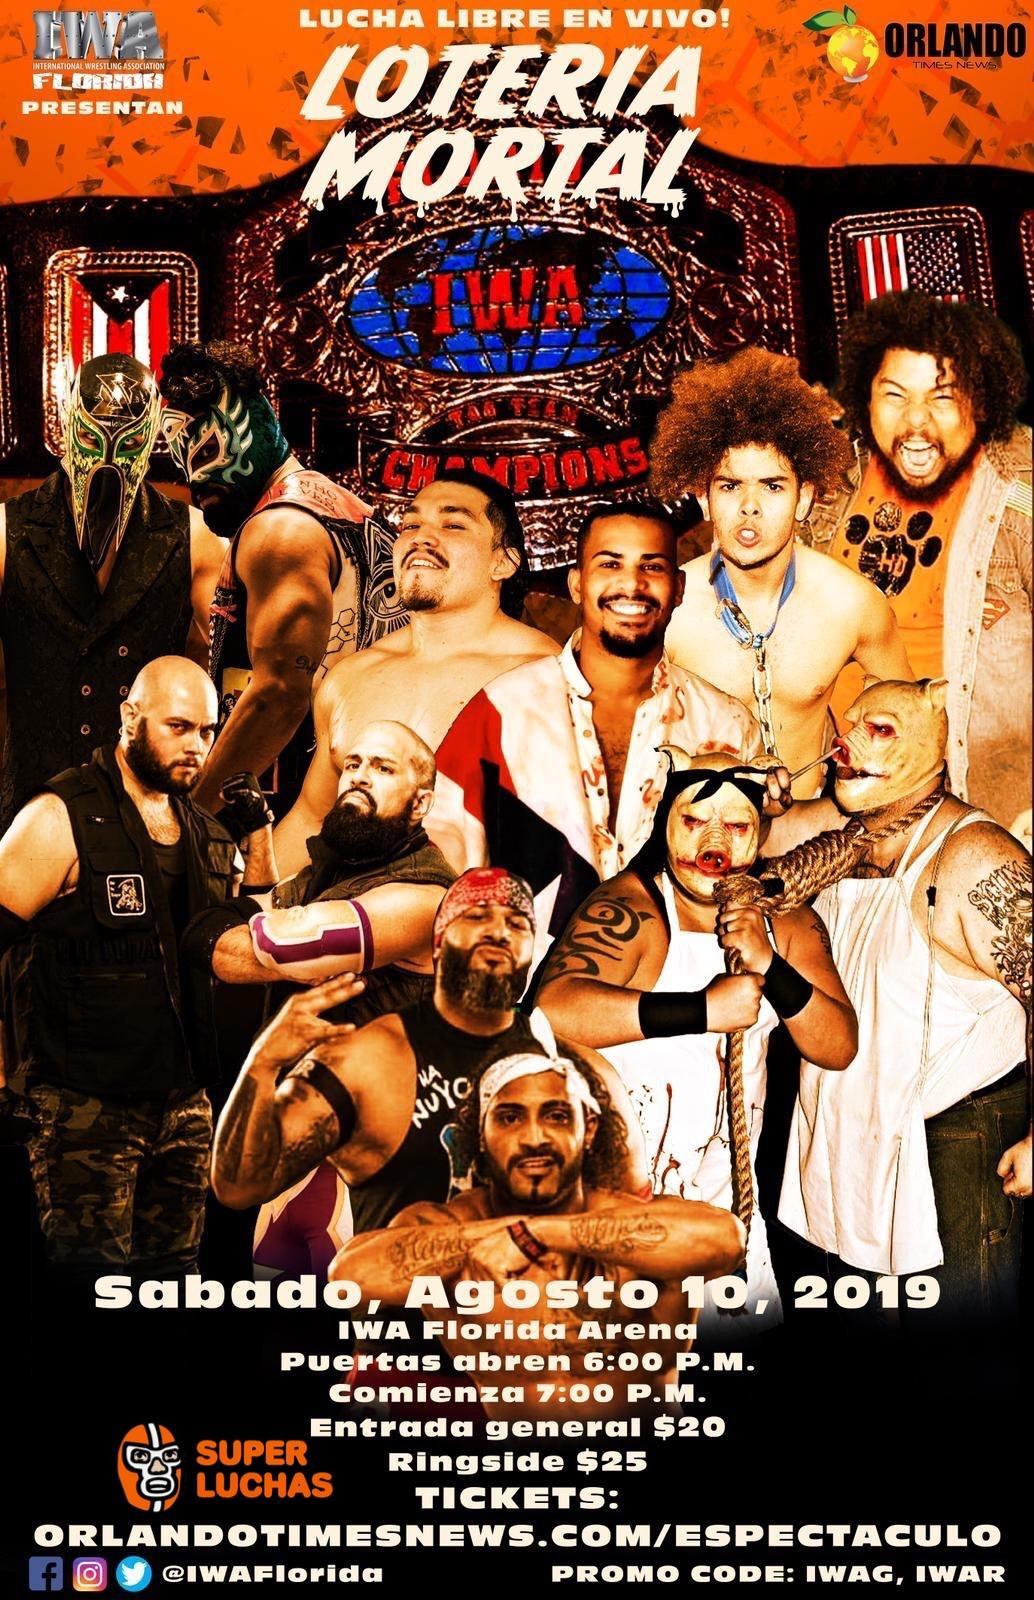 IWA Florida presenta Loteria Mortal este 10 de Agosto en Orlando 1